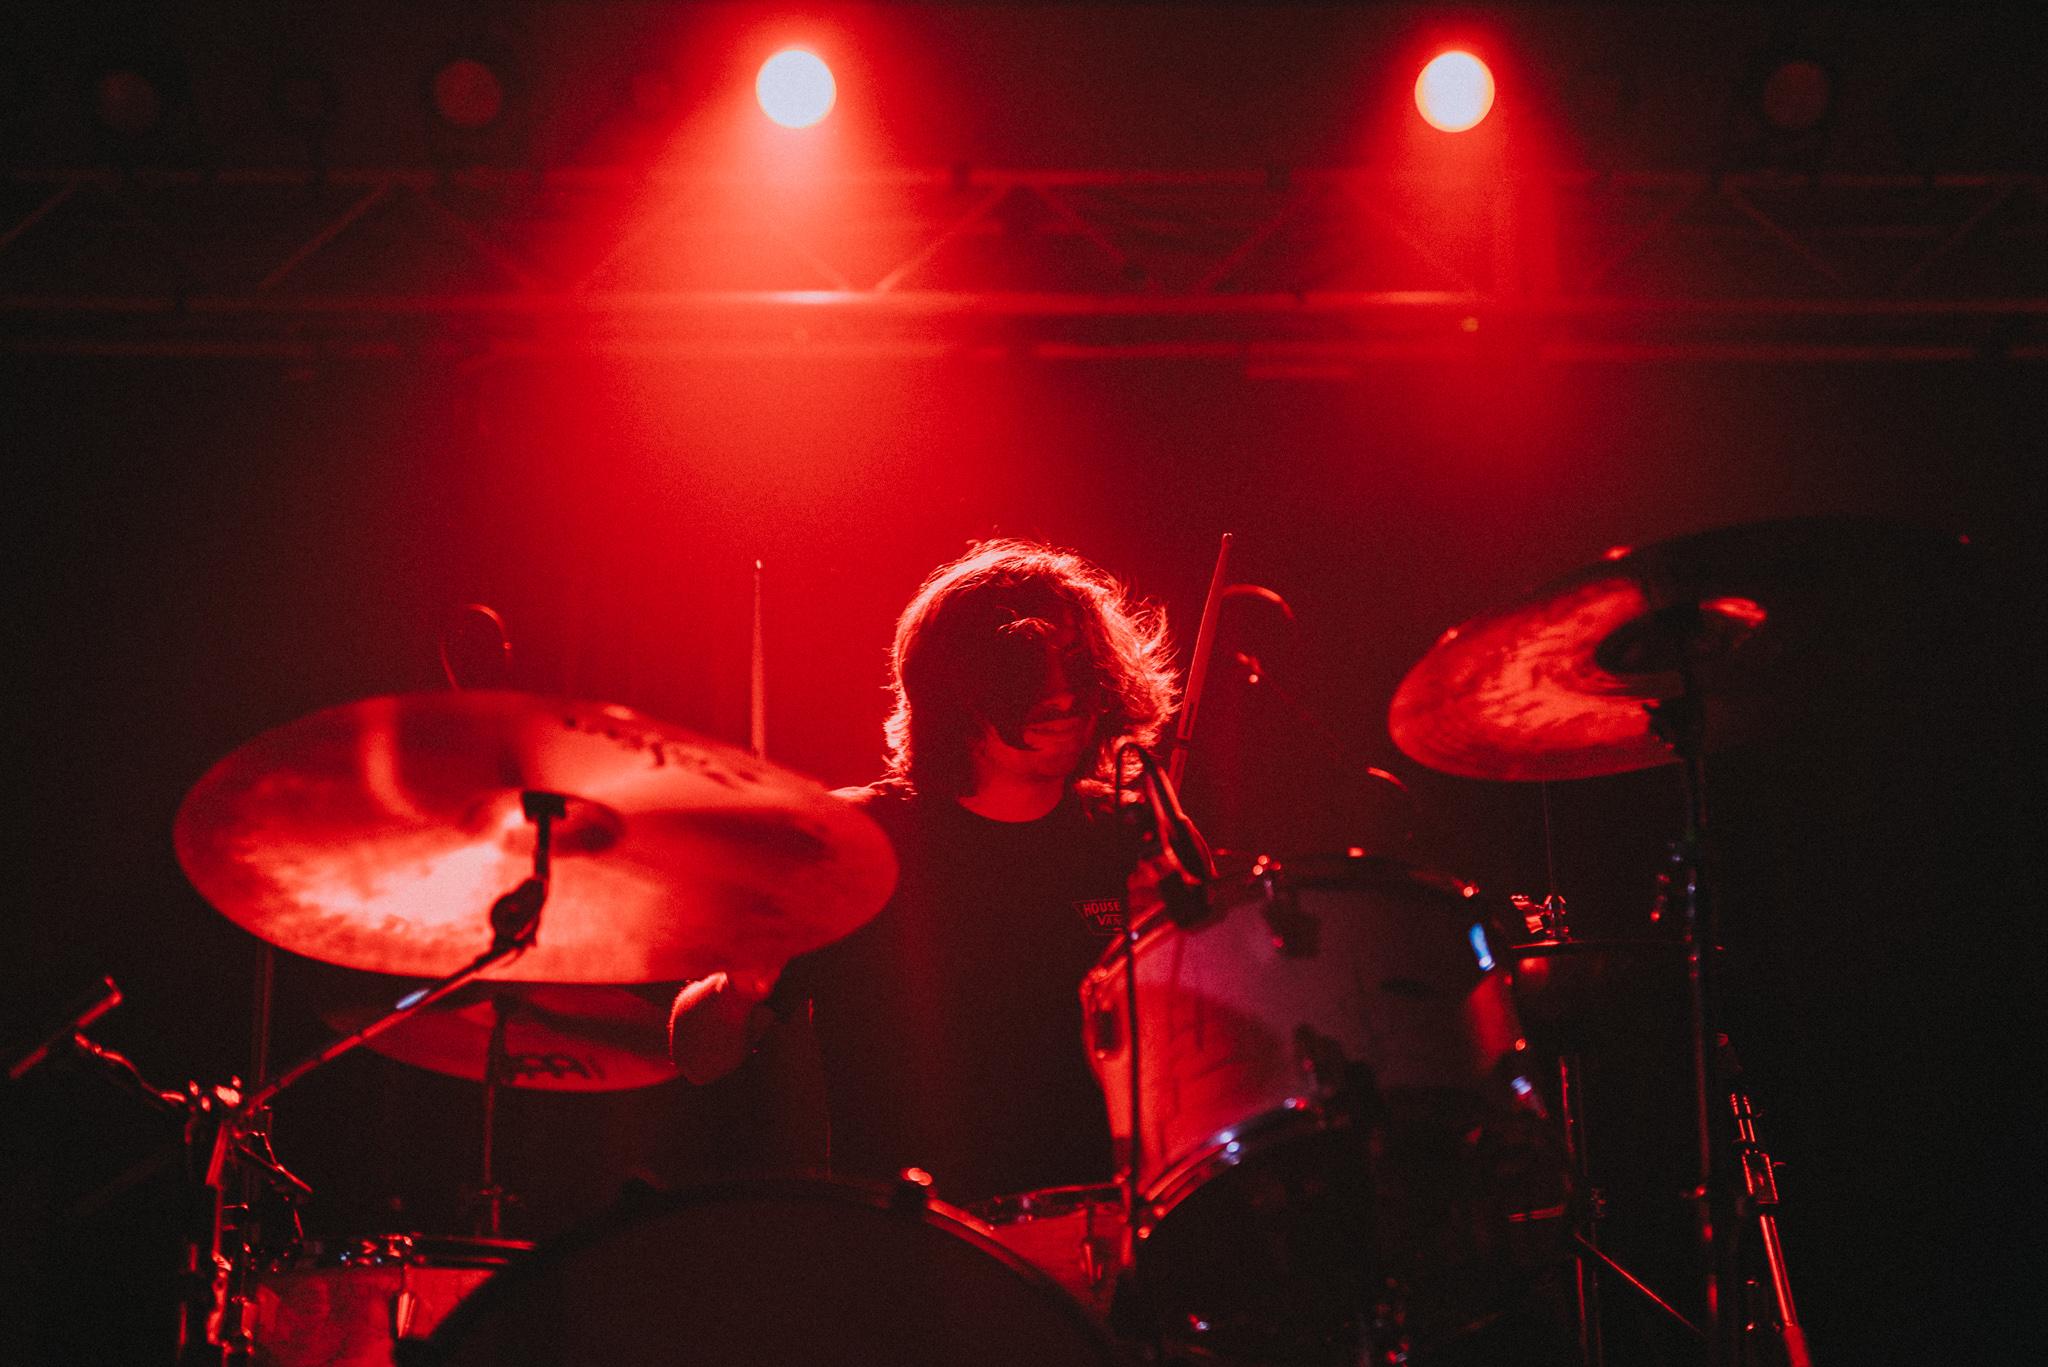 Mario of Chon playing drums for F.C.P.R.E.M.I.X!